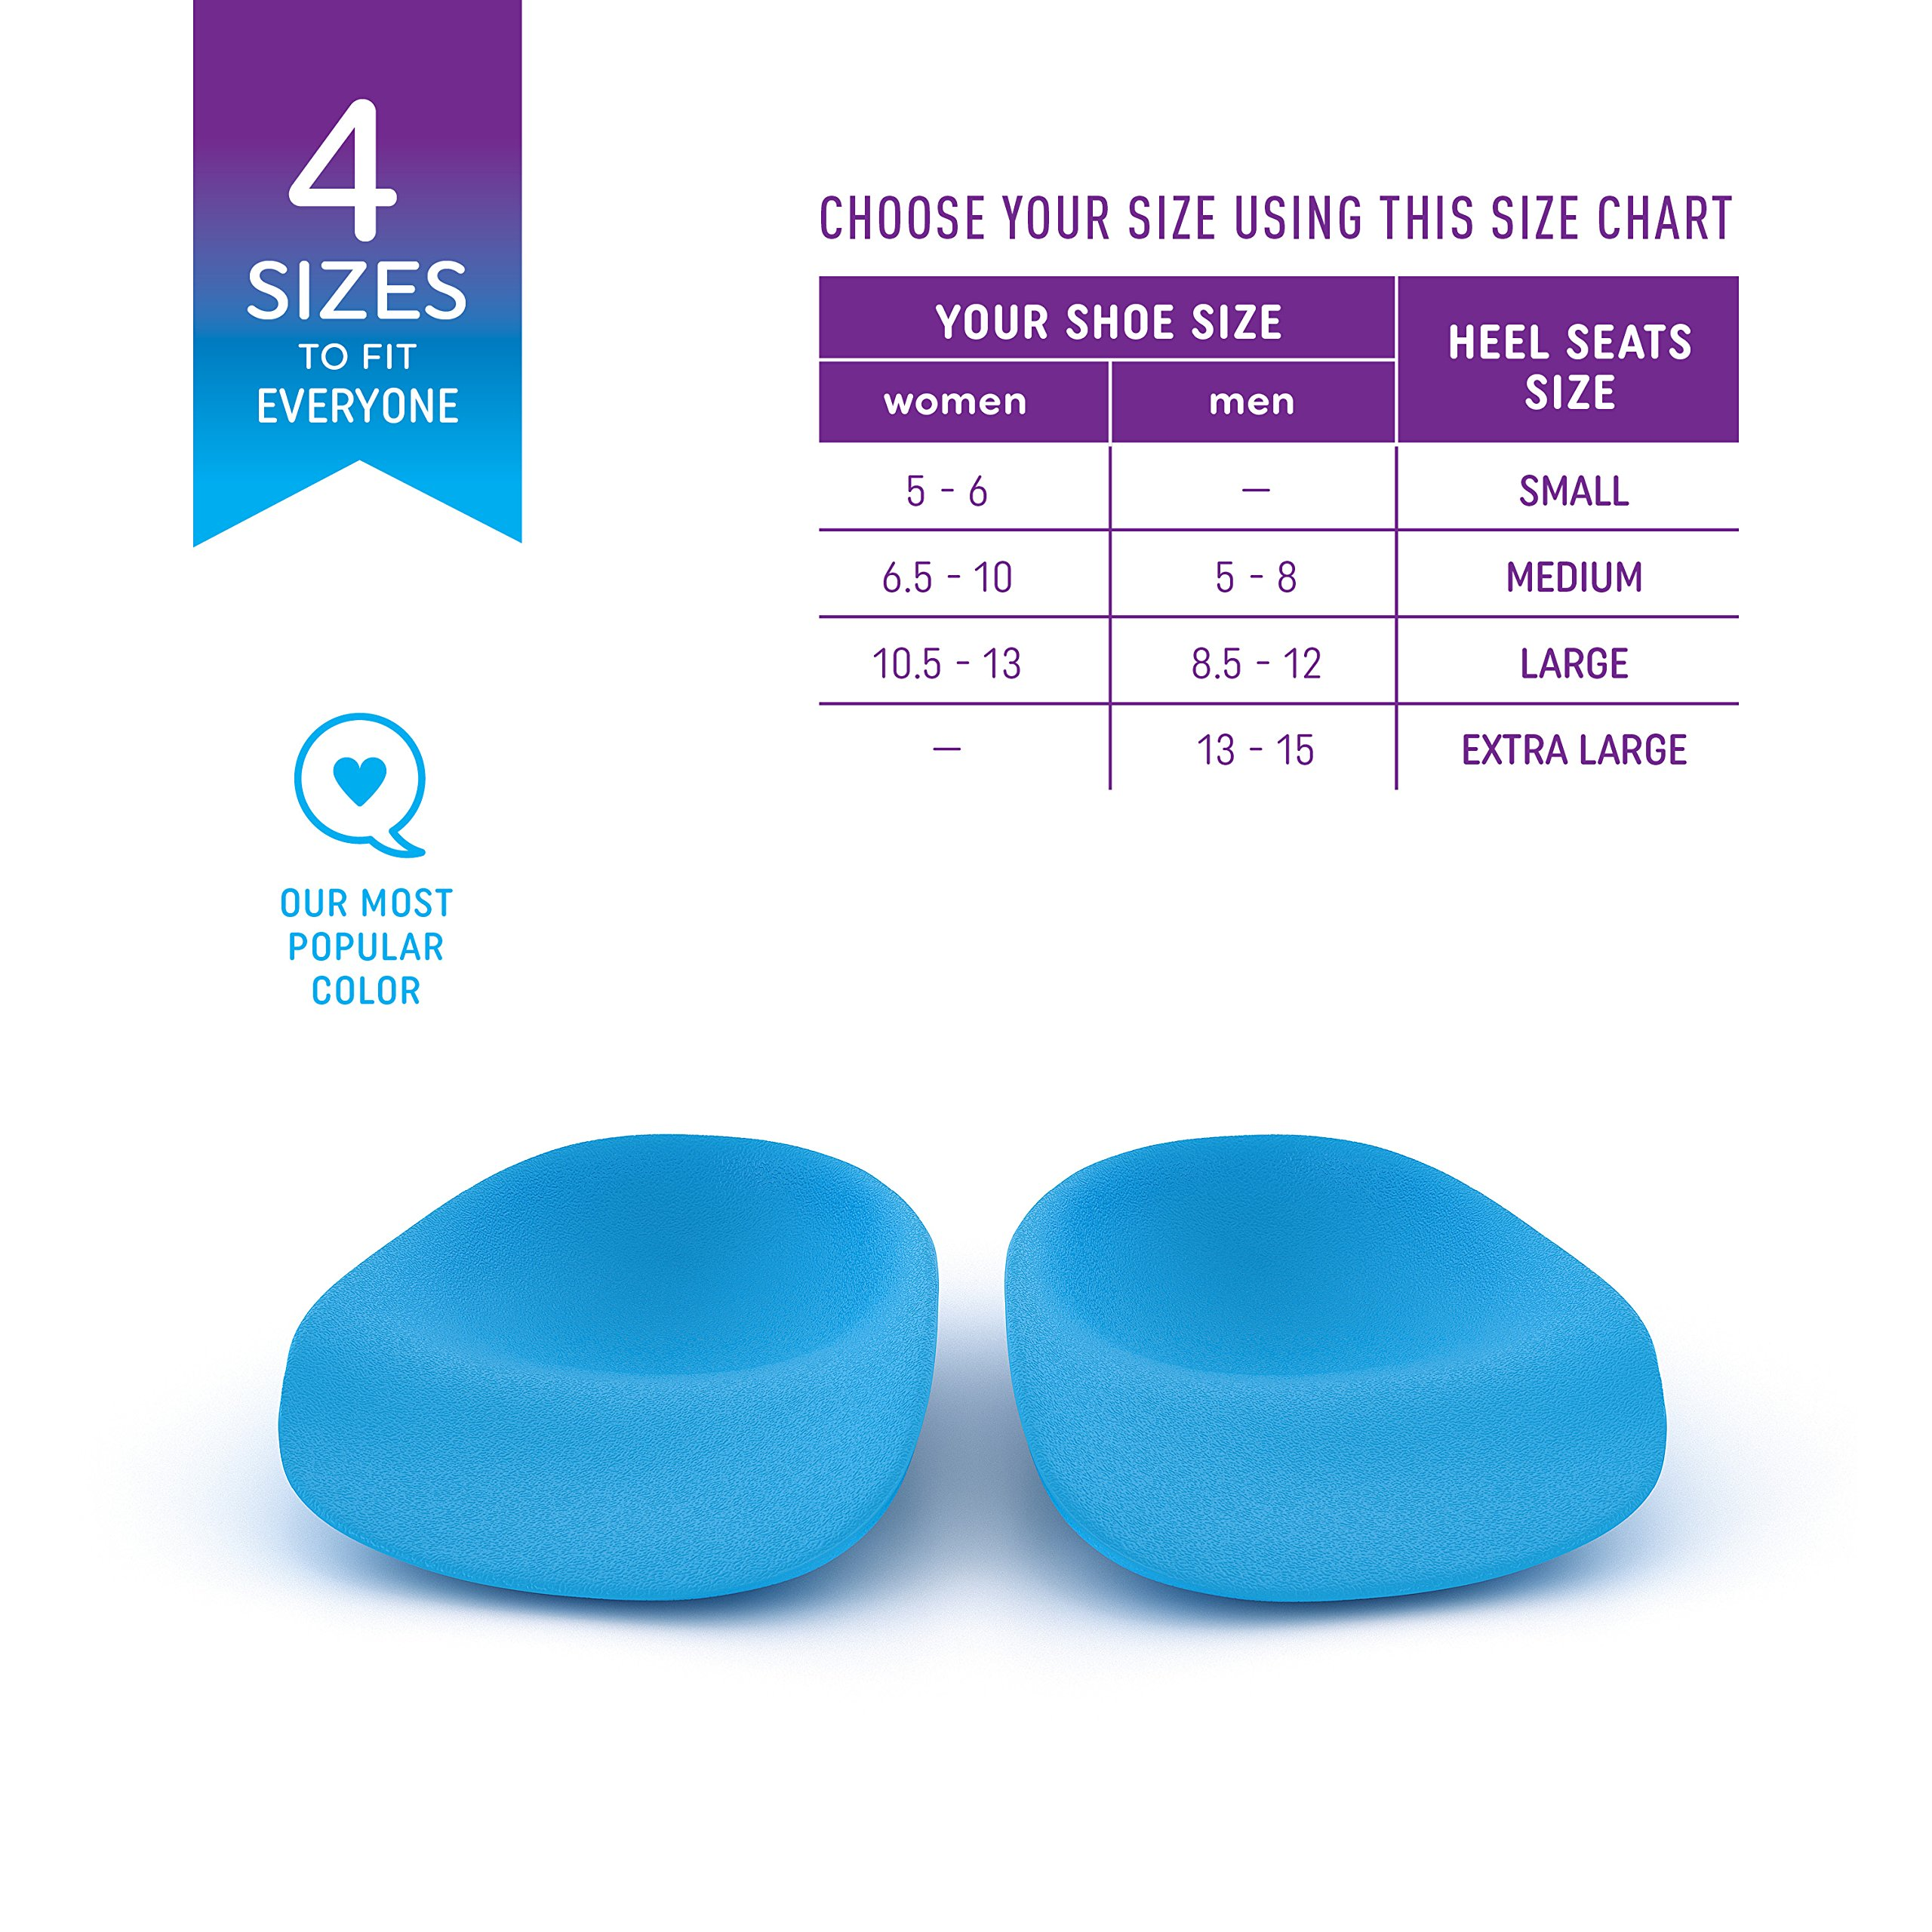 Heel That Pain Sensitive Feet Starter Kit - Gel and Original Heel Seats Foot Orthotic Inserts - Heel Cups Cushions Insoles for Plantar Fasciitis, Heel Spurs, Medium (Women's 7-10, Men's 5-8) by Heel That Pain